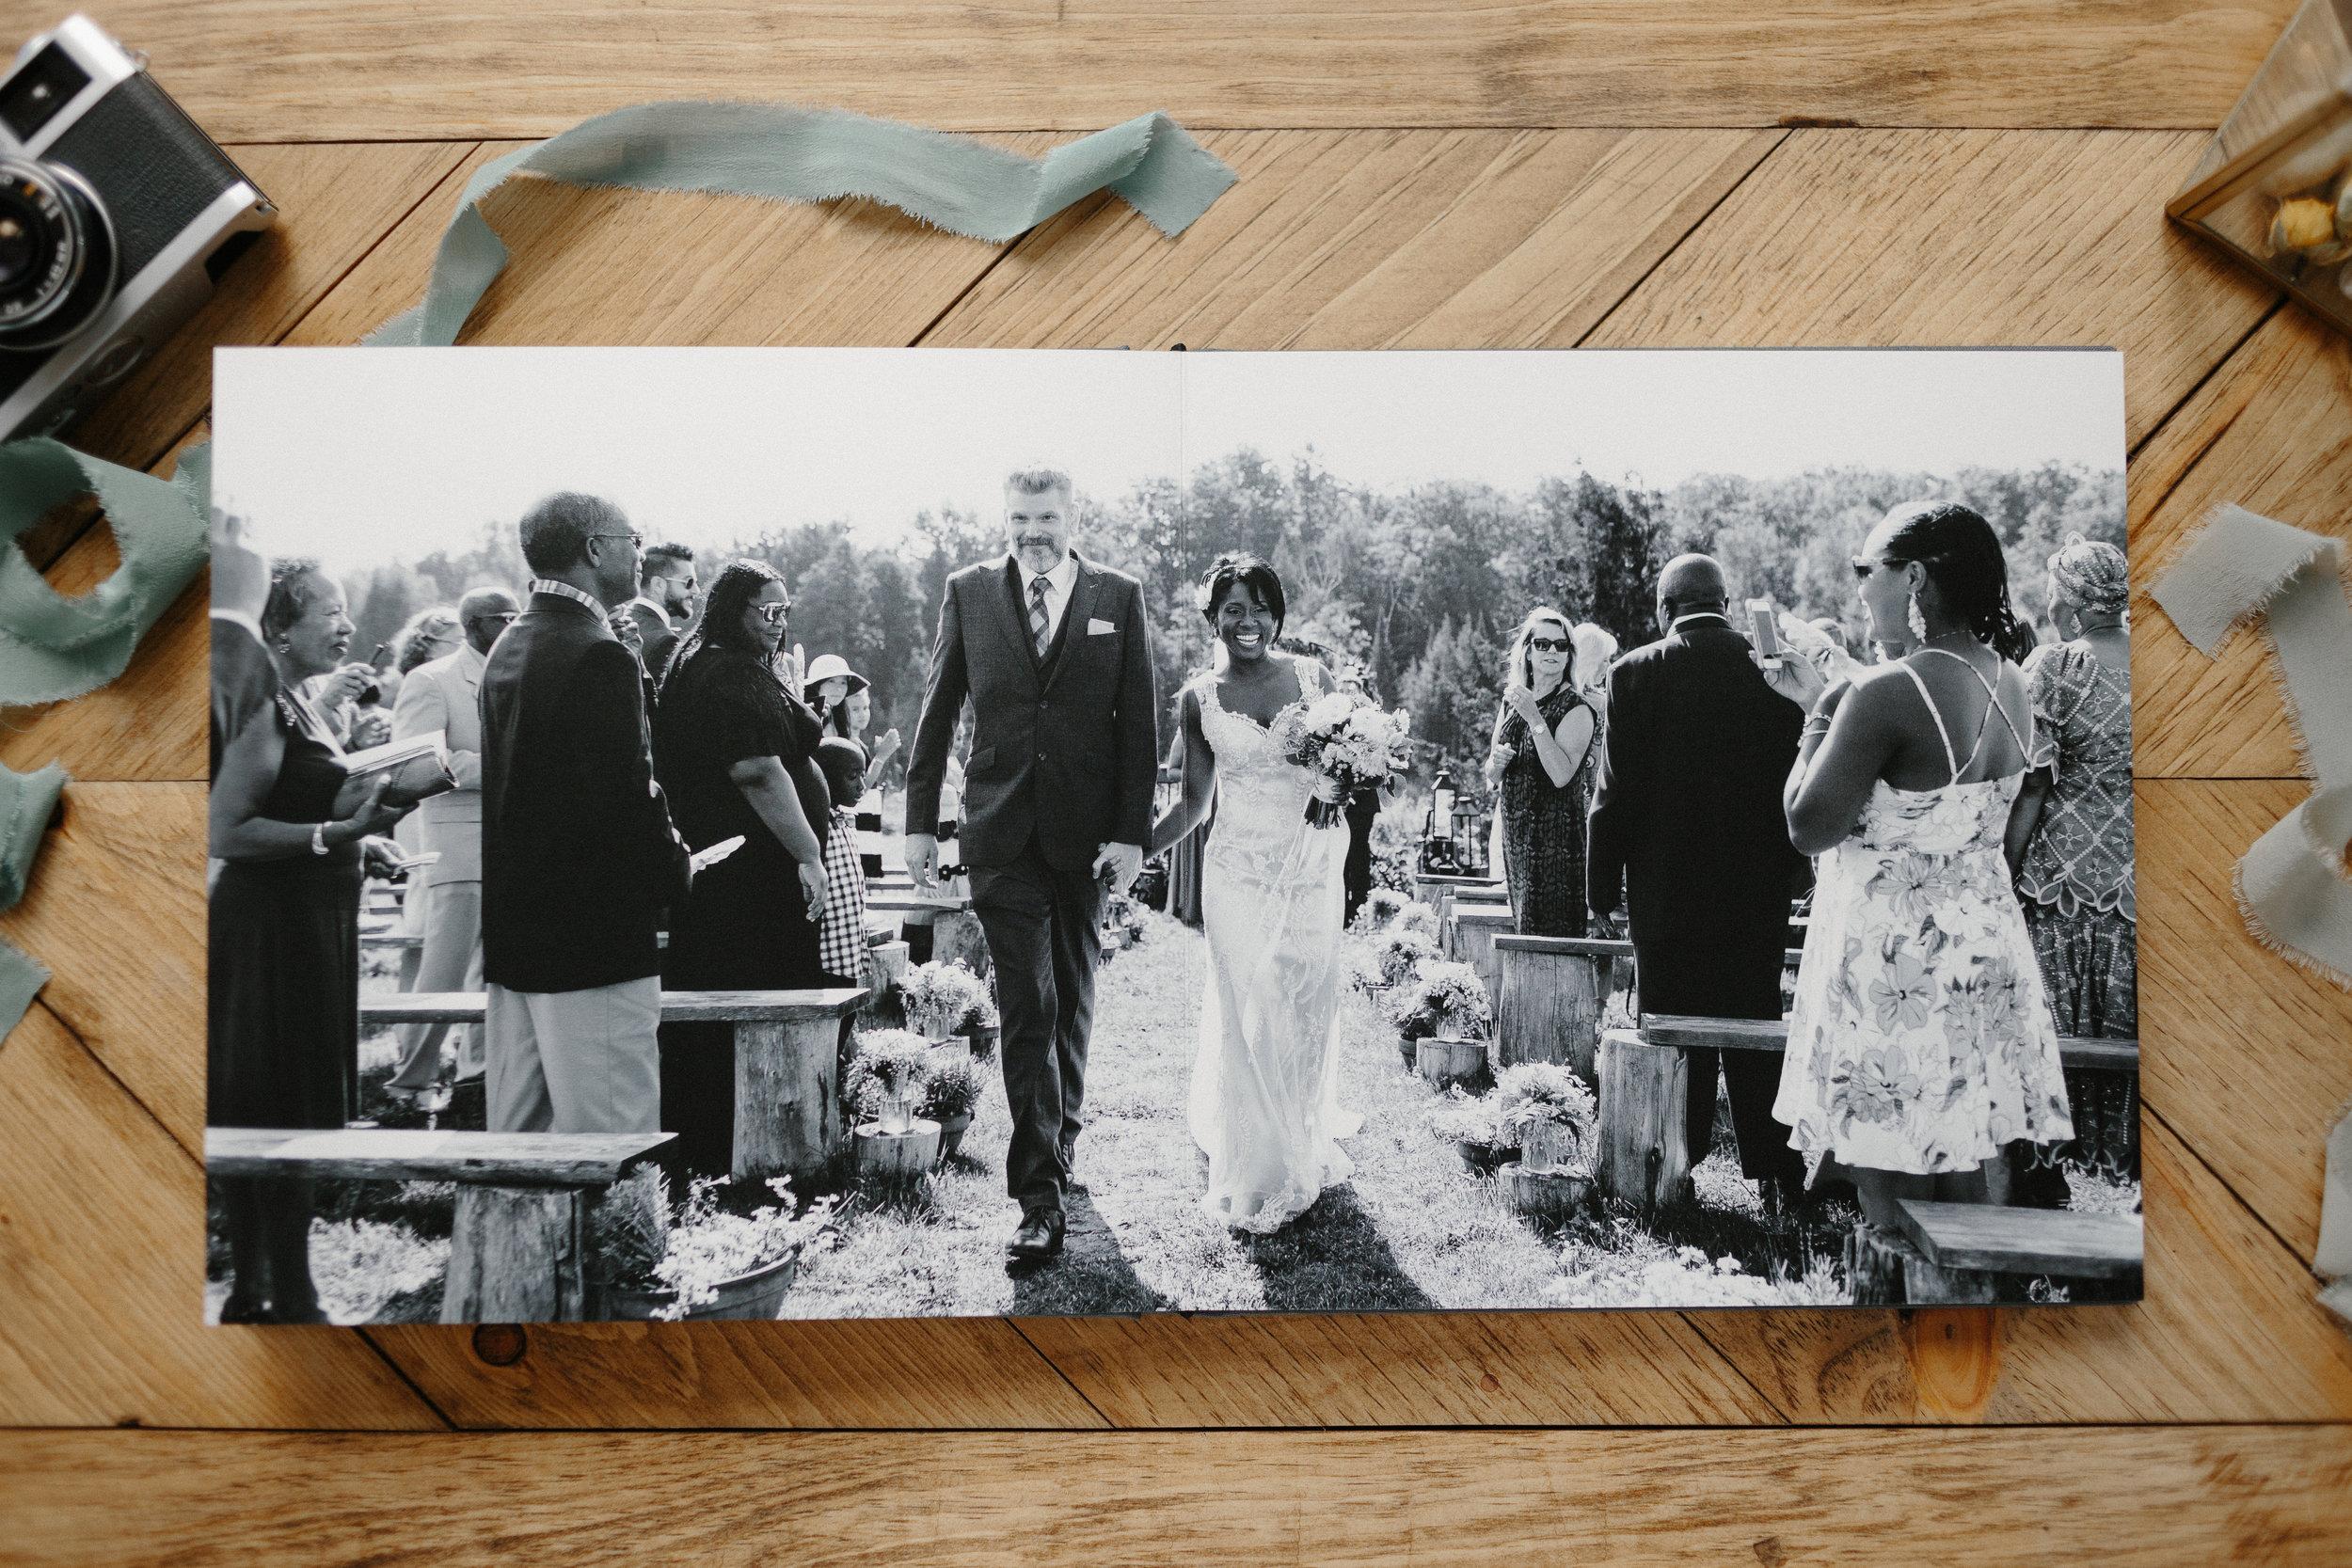 ryanne-hollies-photography-wedding-album-design-details-tono-and-co-artifact-uprising-81.jpg